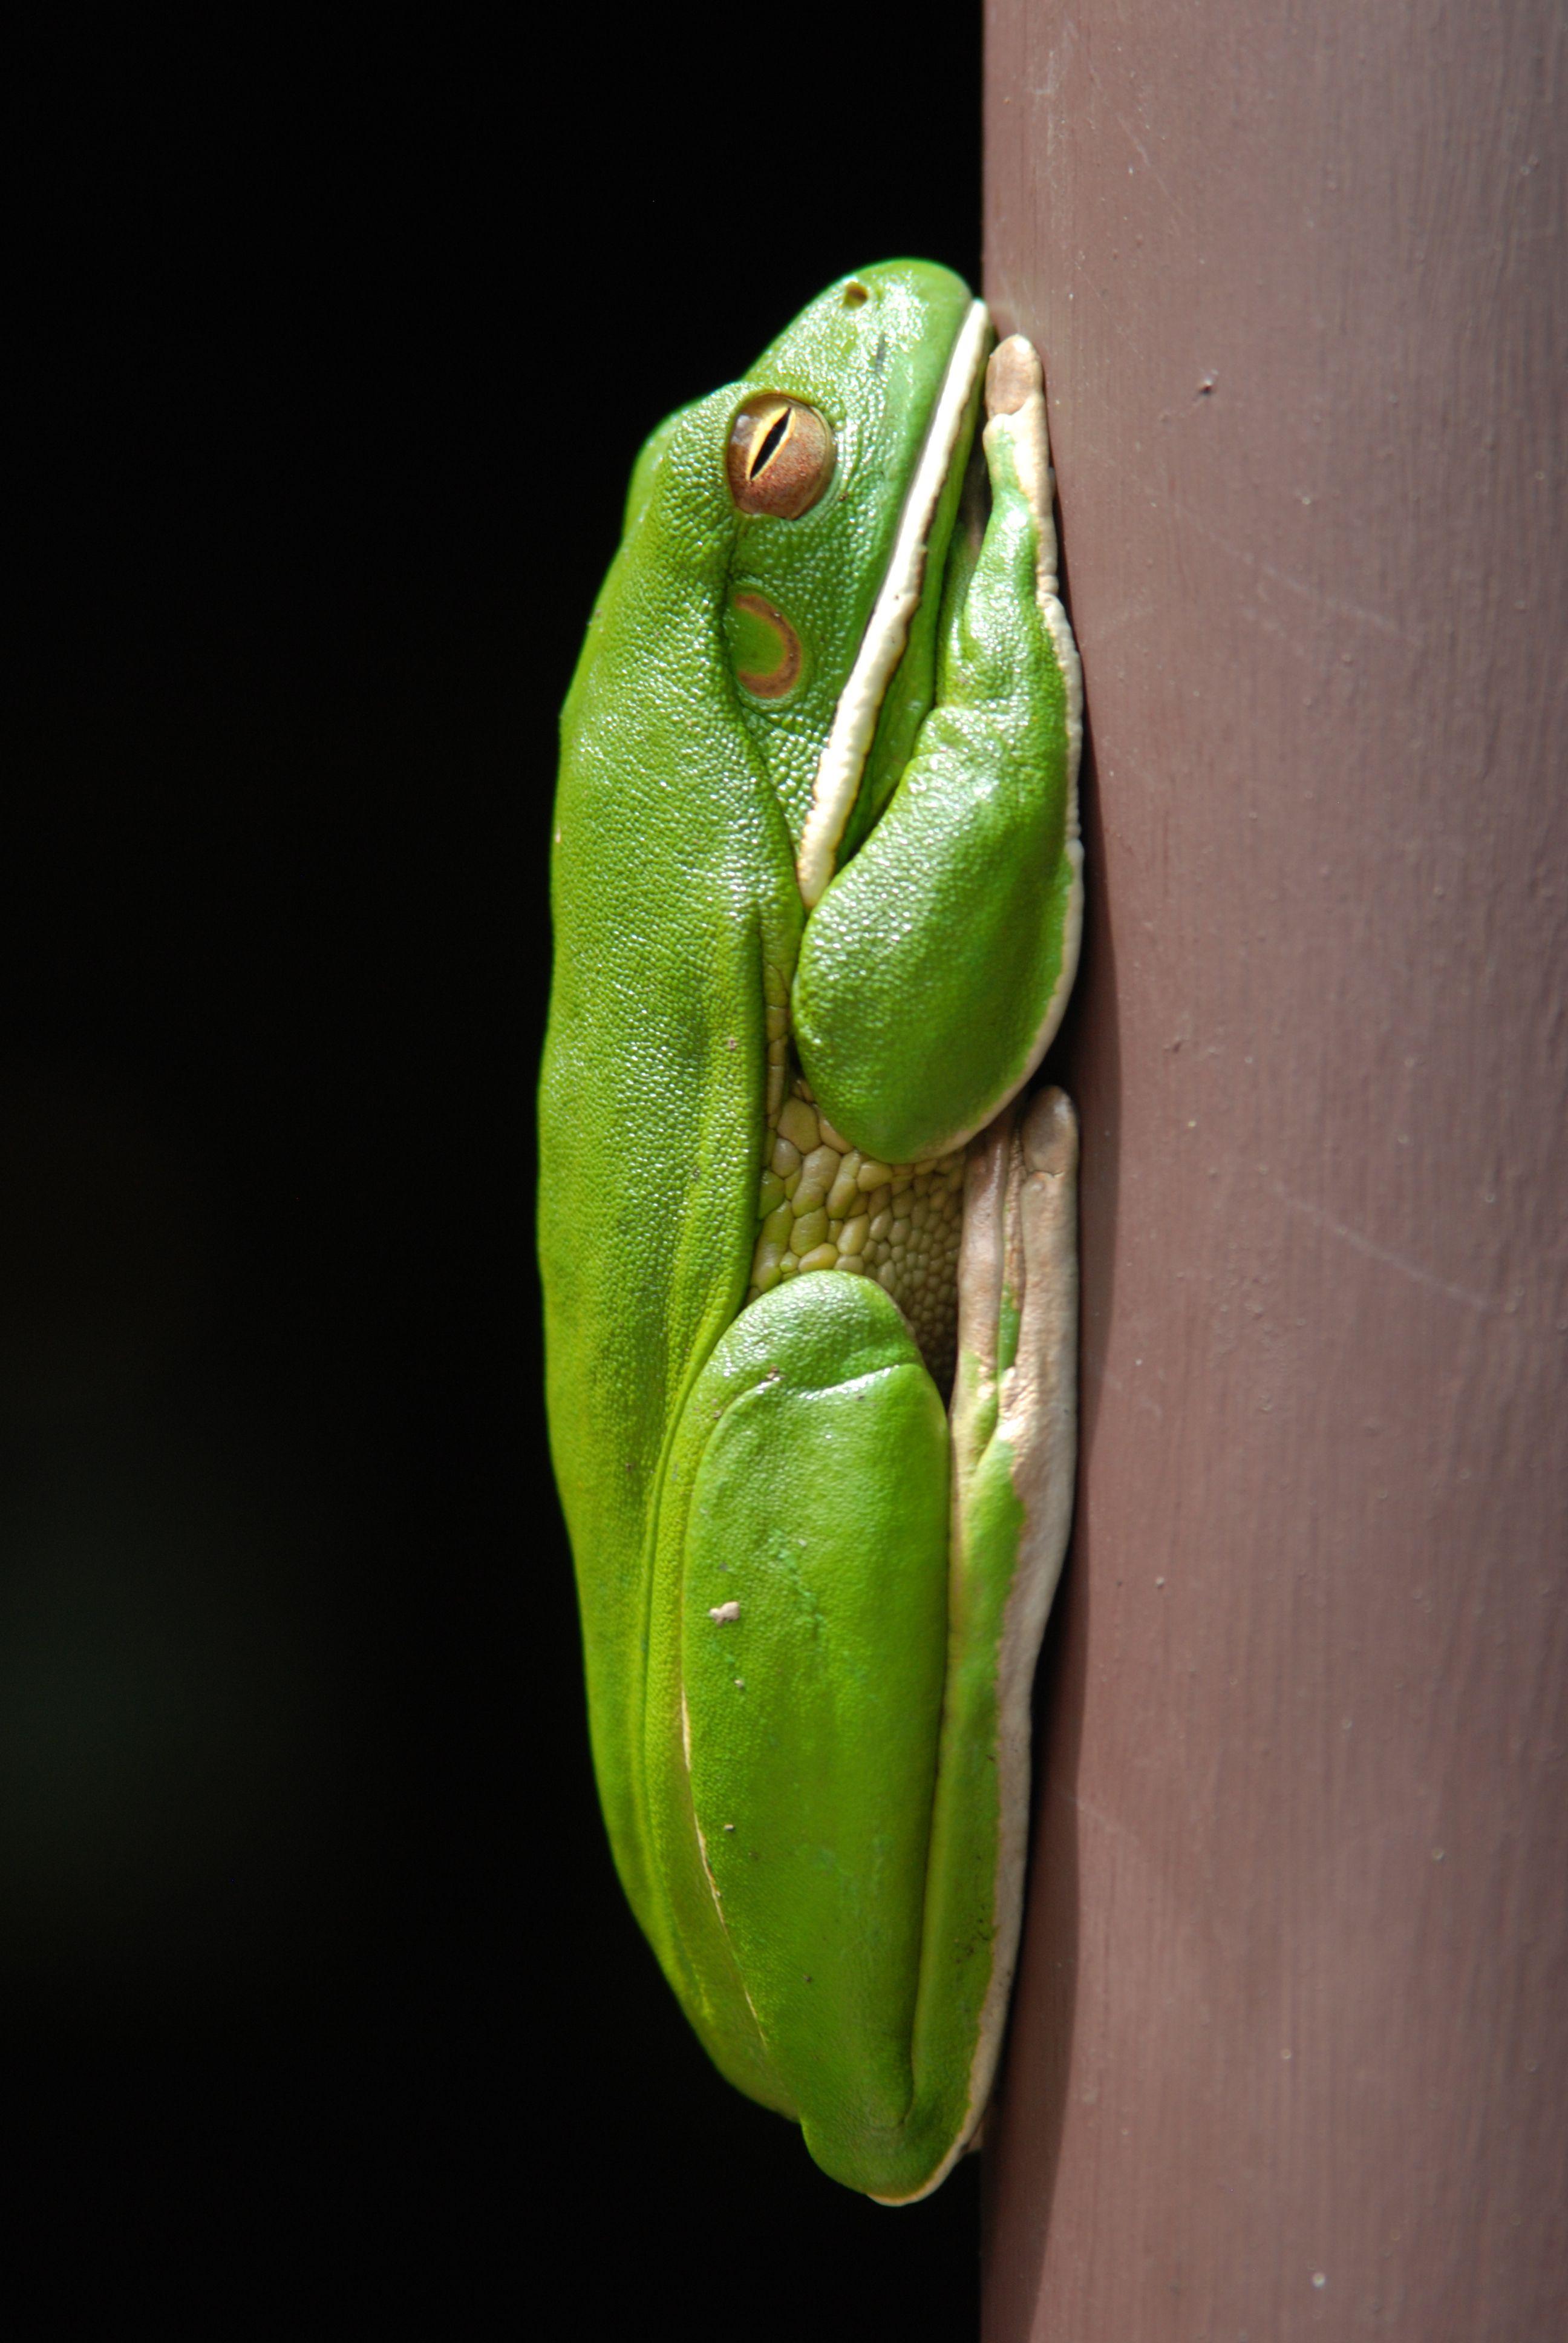 Tree frog, Daintree Rainforest, Queensland, Australia